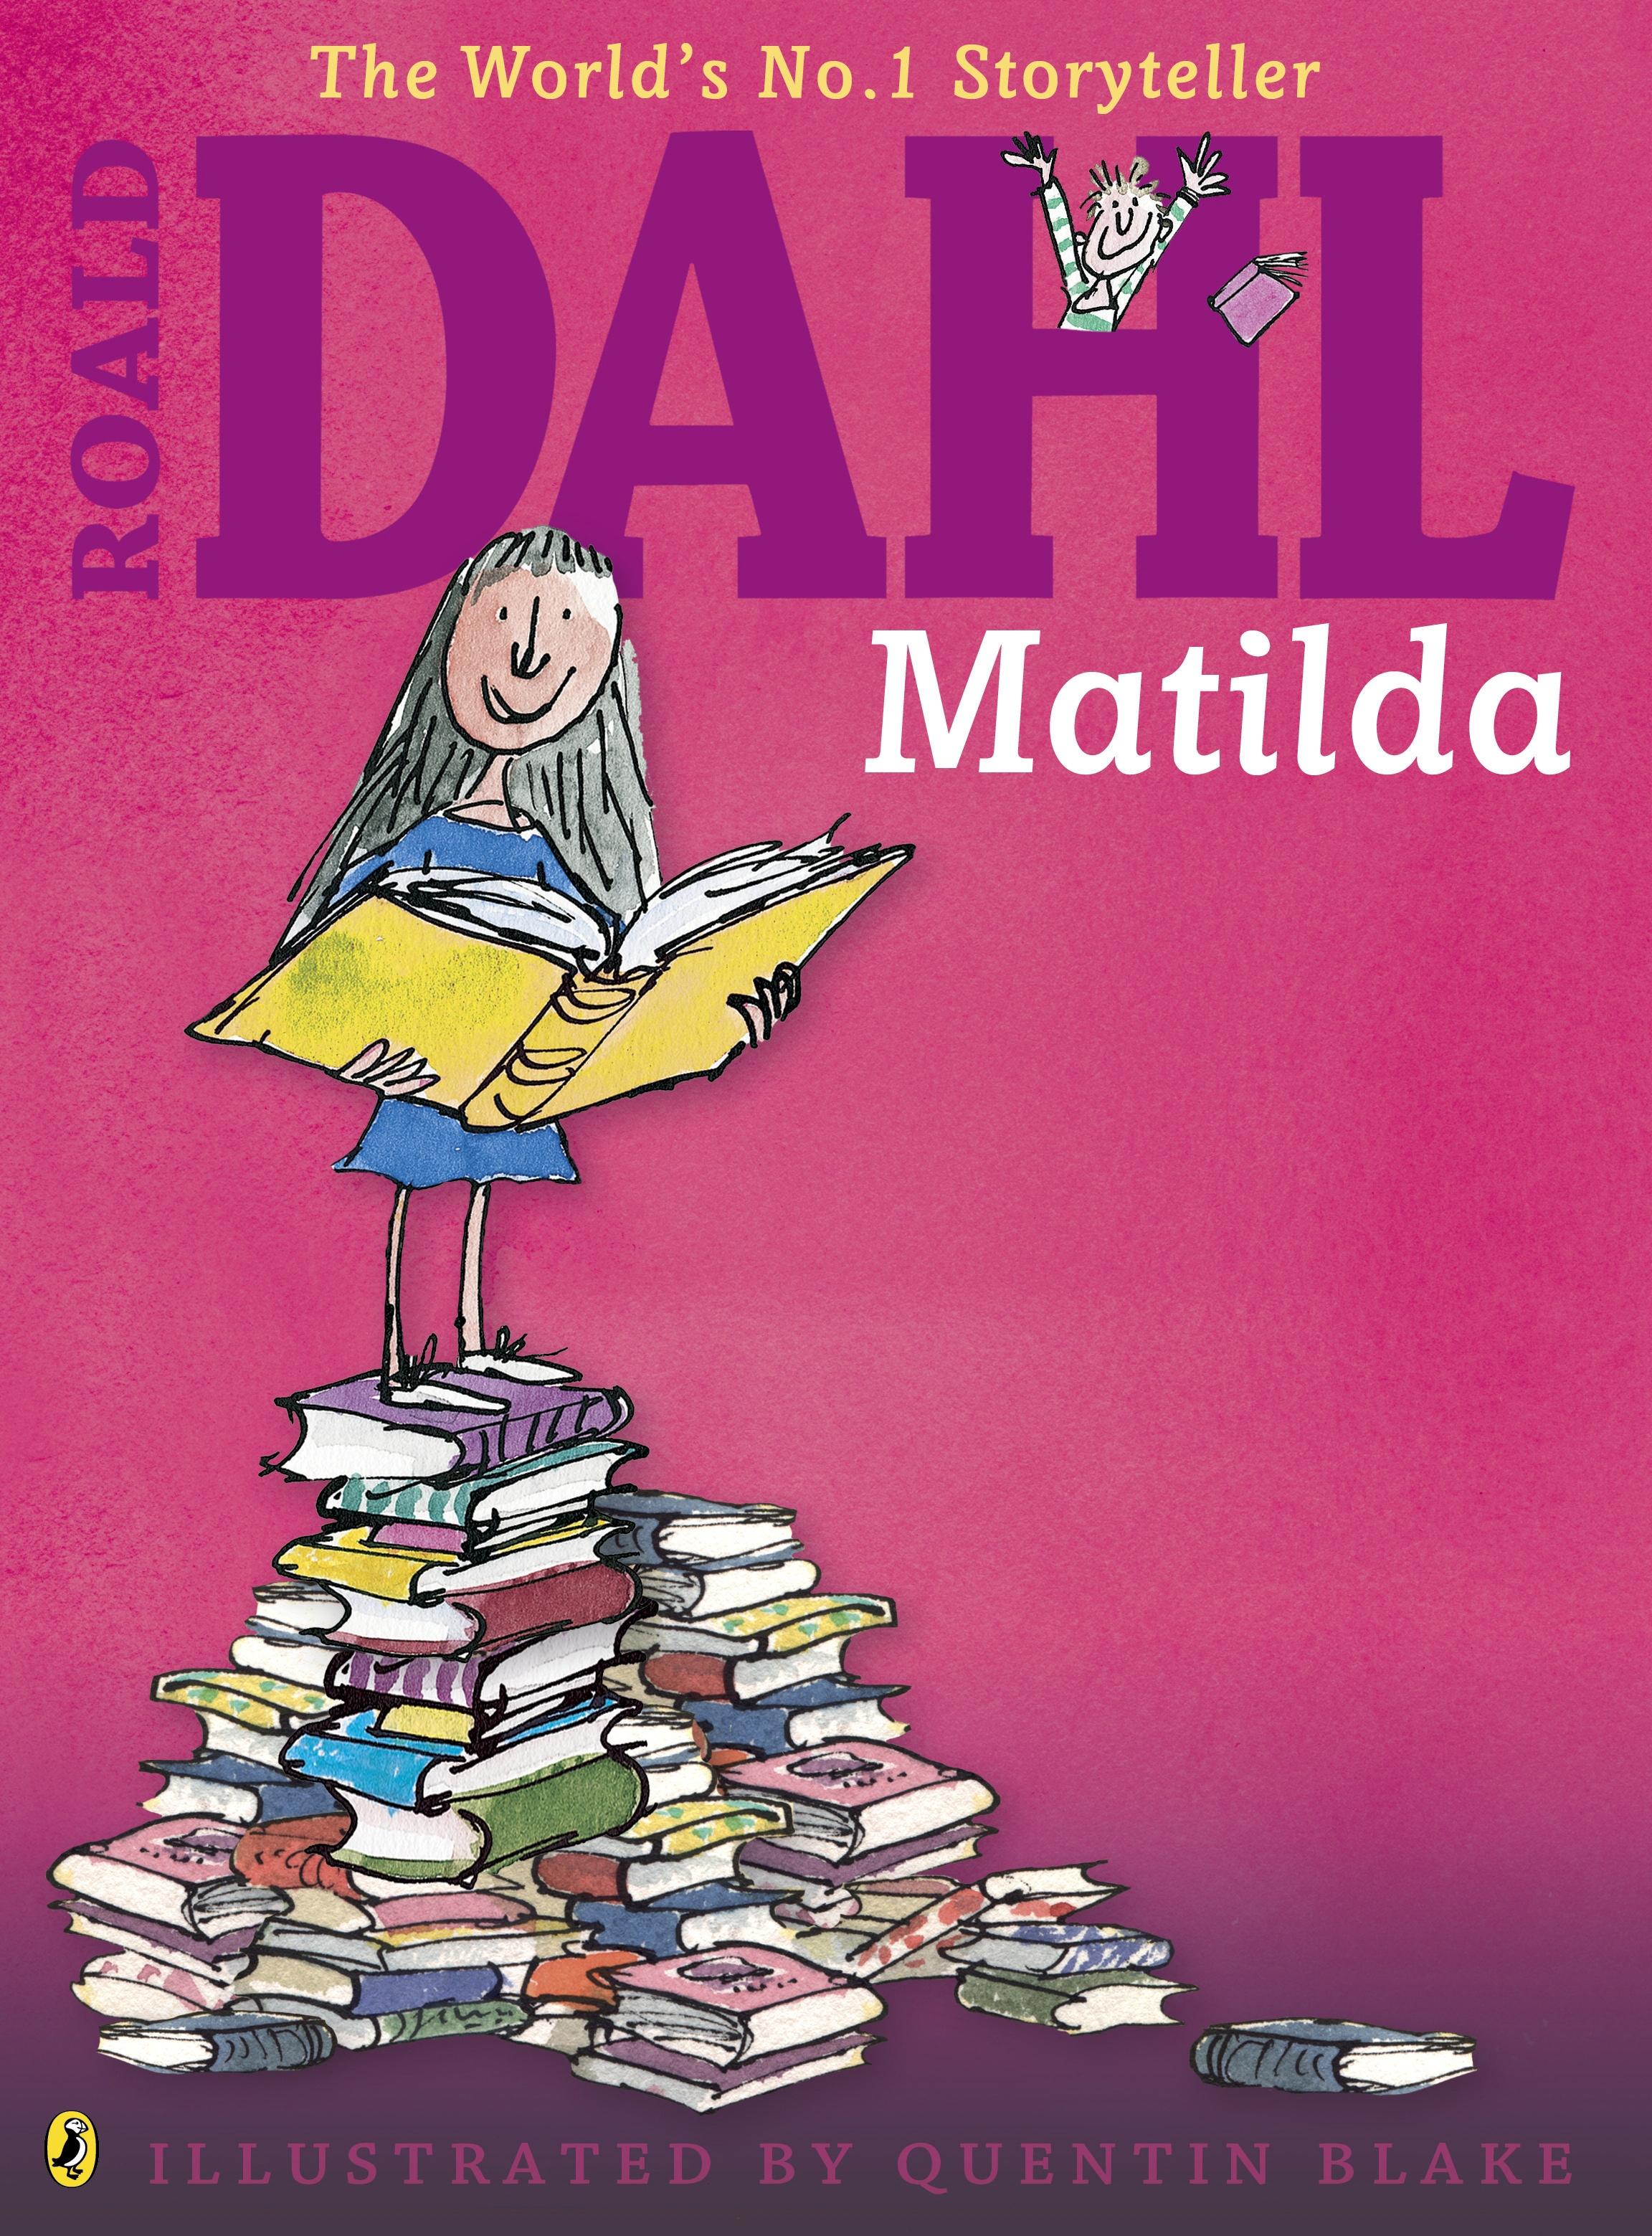 Childhood Favourites Matilda By Roald Dahl Books Baking